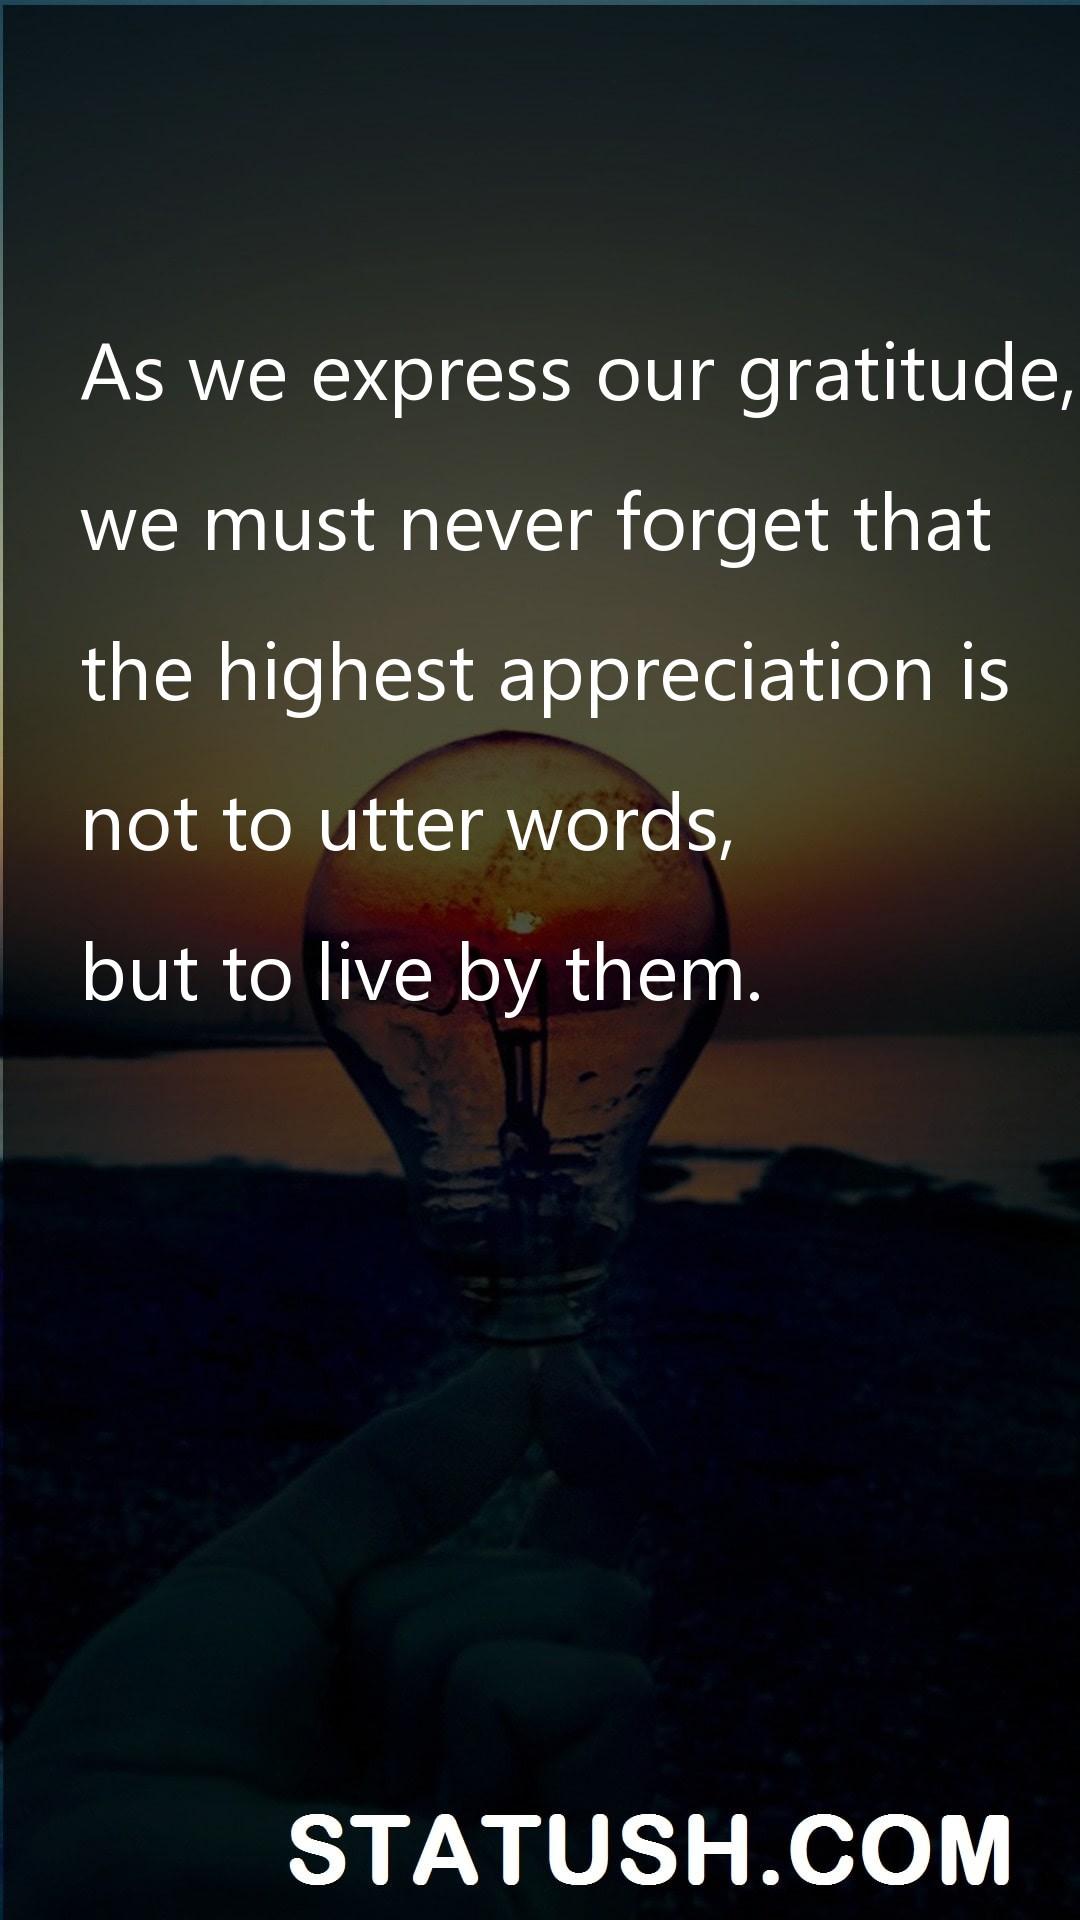 As we express our gratitude